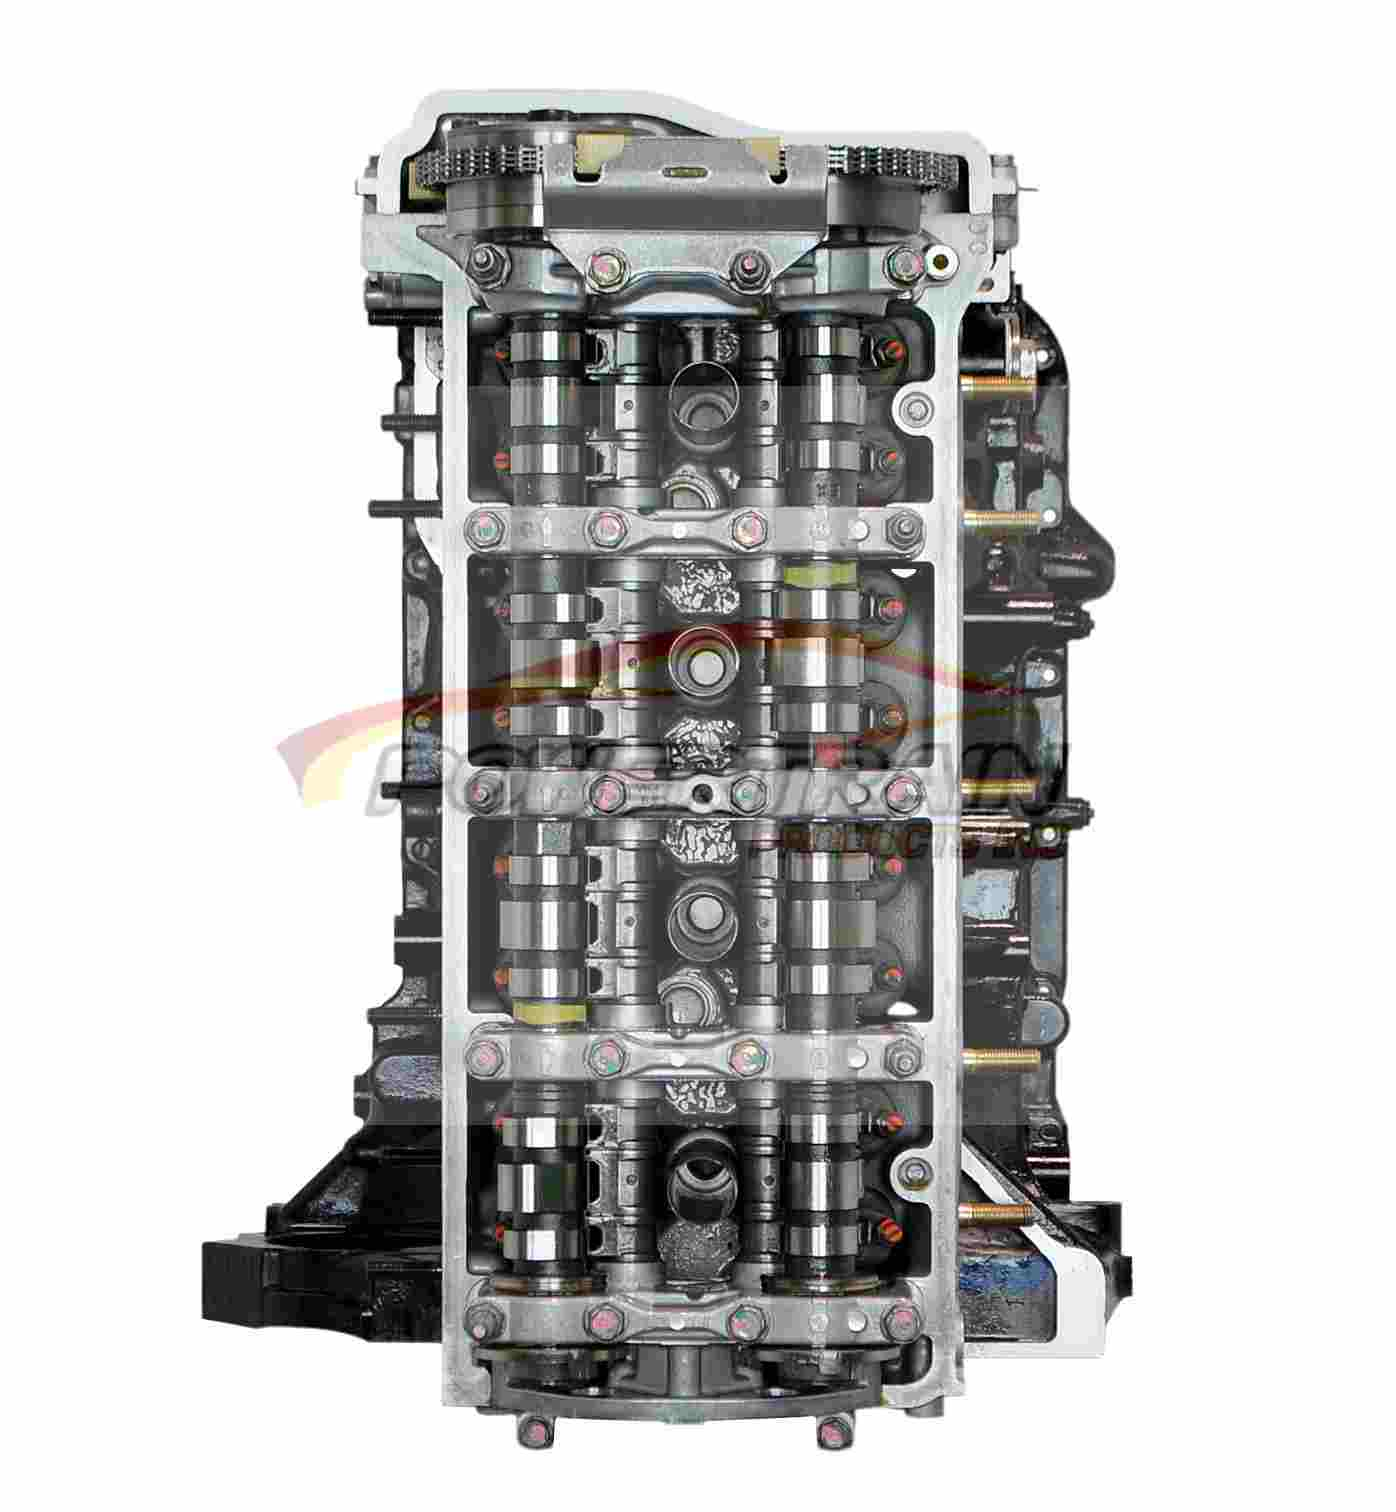 Acura K20z1 engine 06-07 comp engine